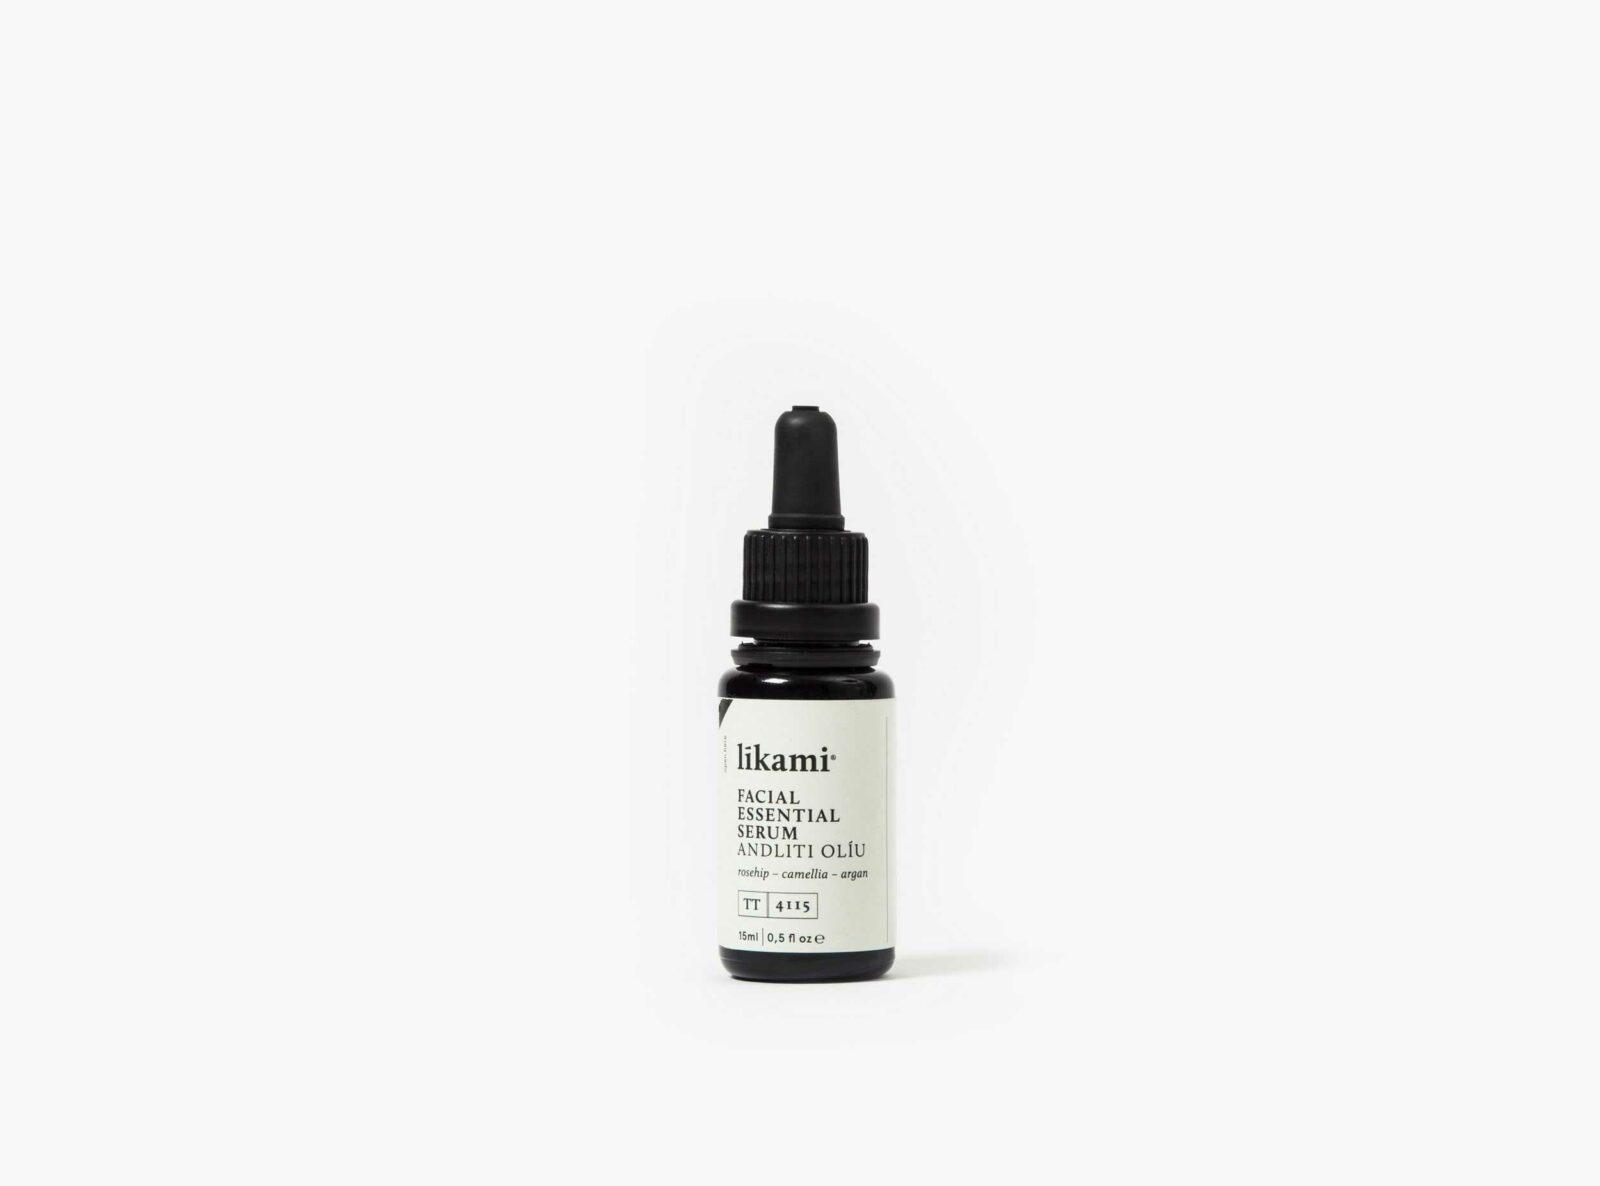 Likami Likami Facial Essential Serum 15 ML